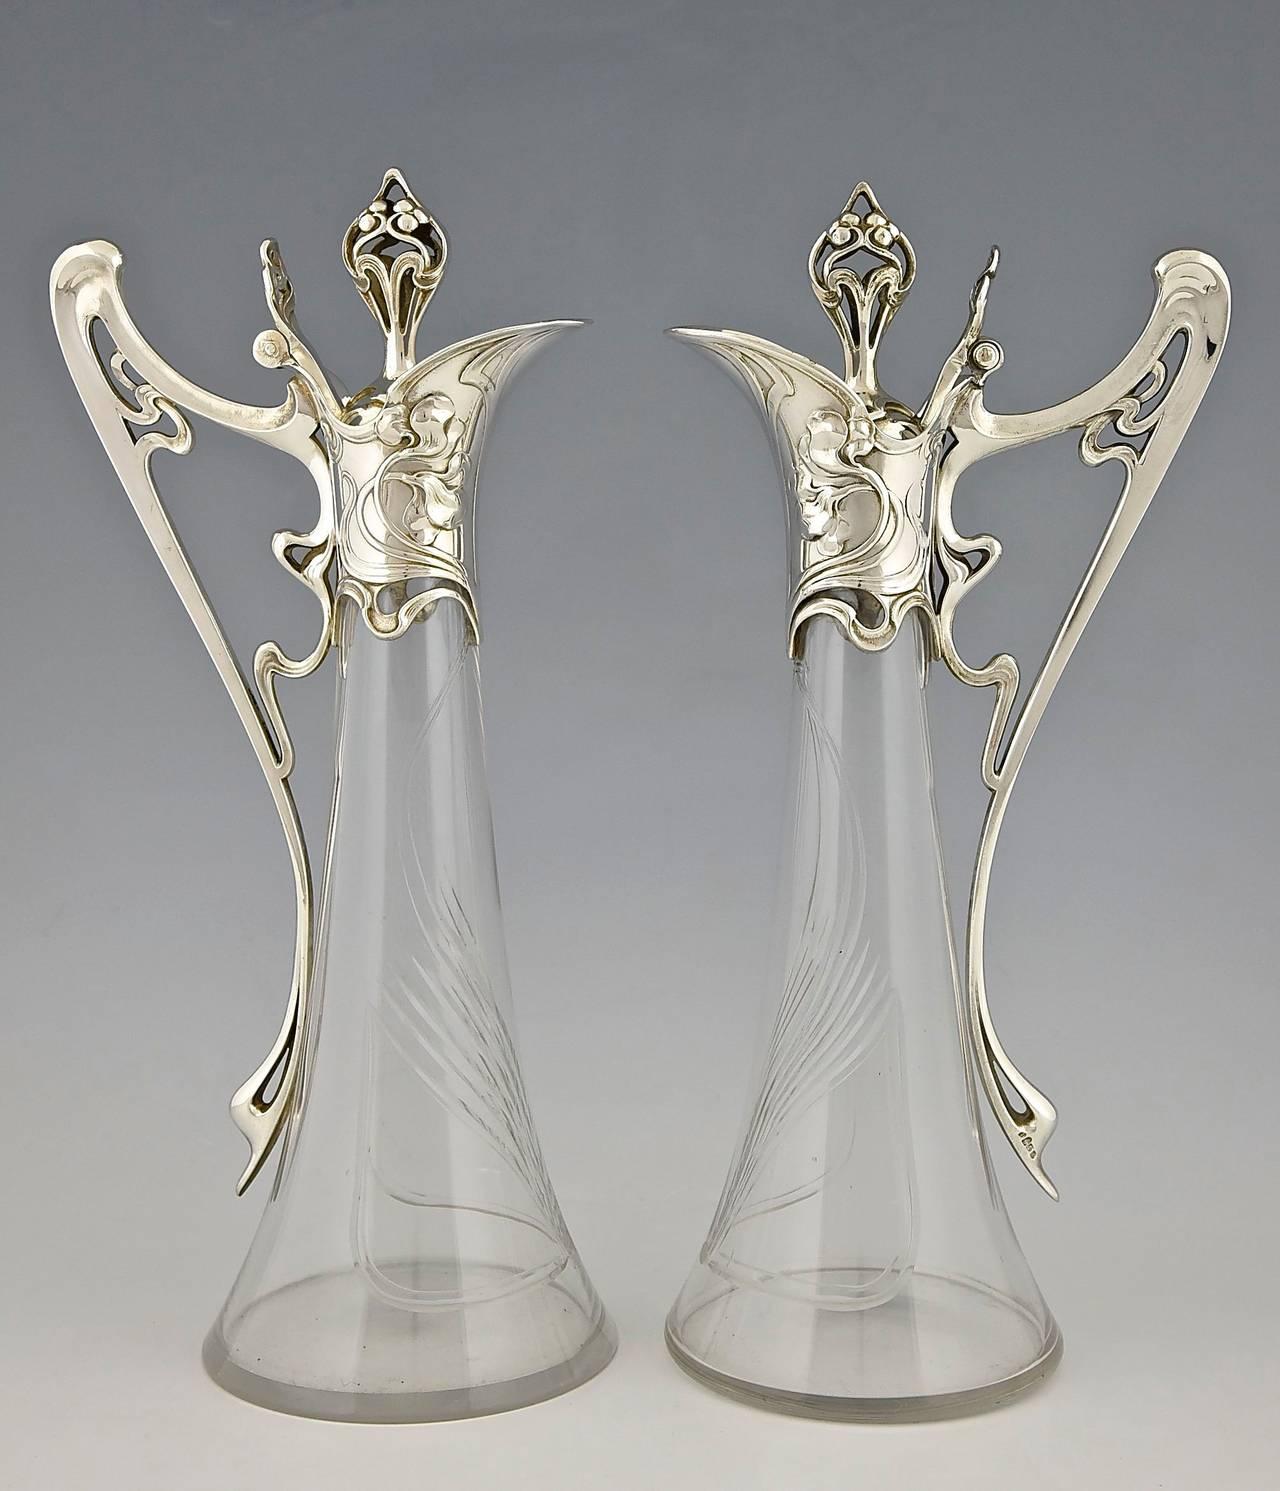 Pair of Art Nouveau Claret Jugs by WMF Germany, 1906 ...